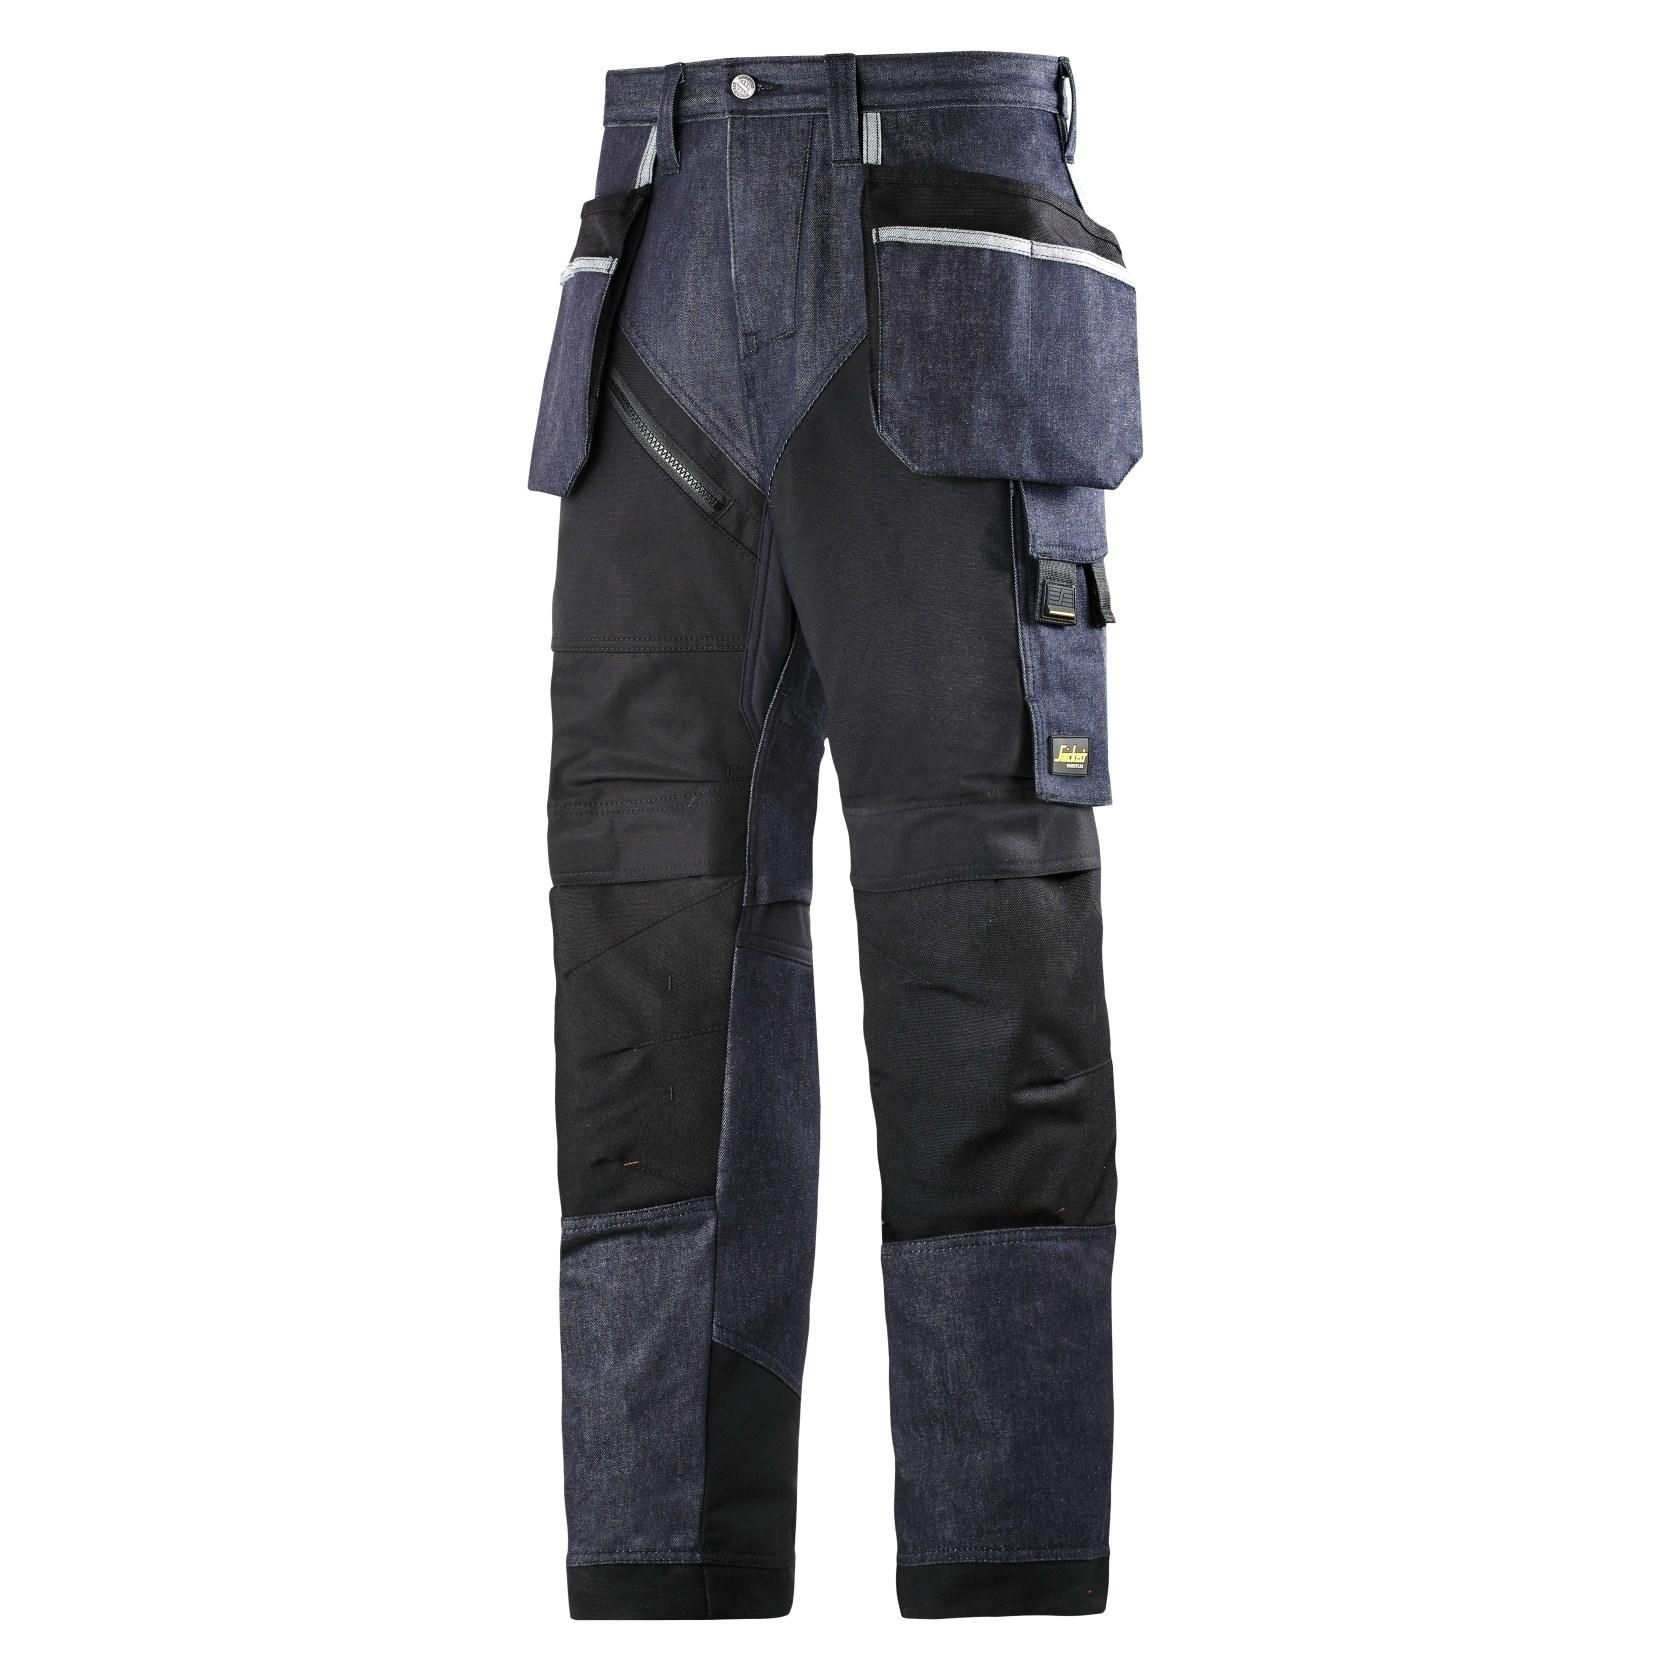 6305 Ruffwork Denim, Arbeidsbukse snickers workwear